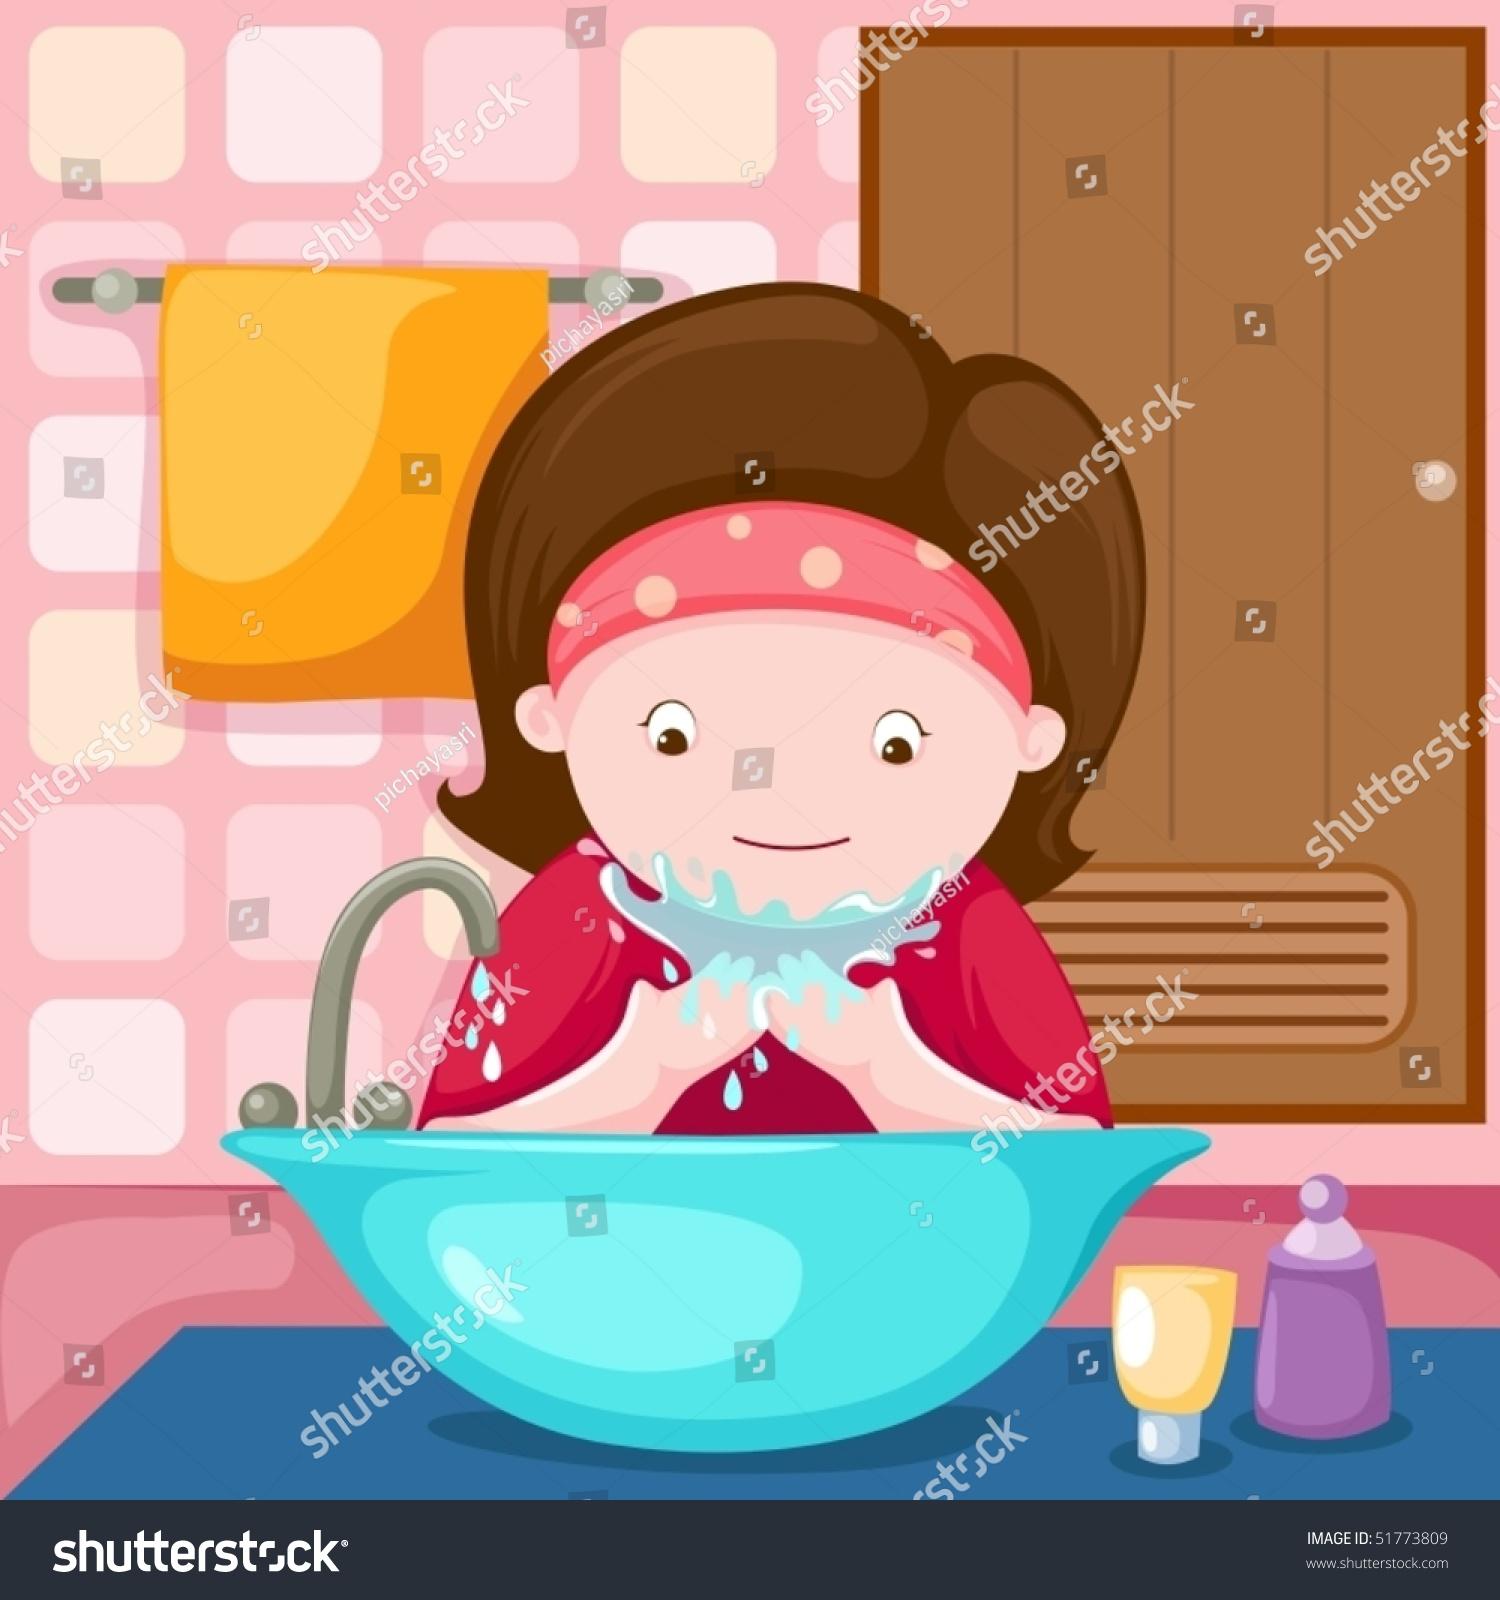 Fashion Clipart Light Skin Bubble Bath Clipart Cute Girl: Illustration Of Girl Washing Her Face… Stock Photo